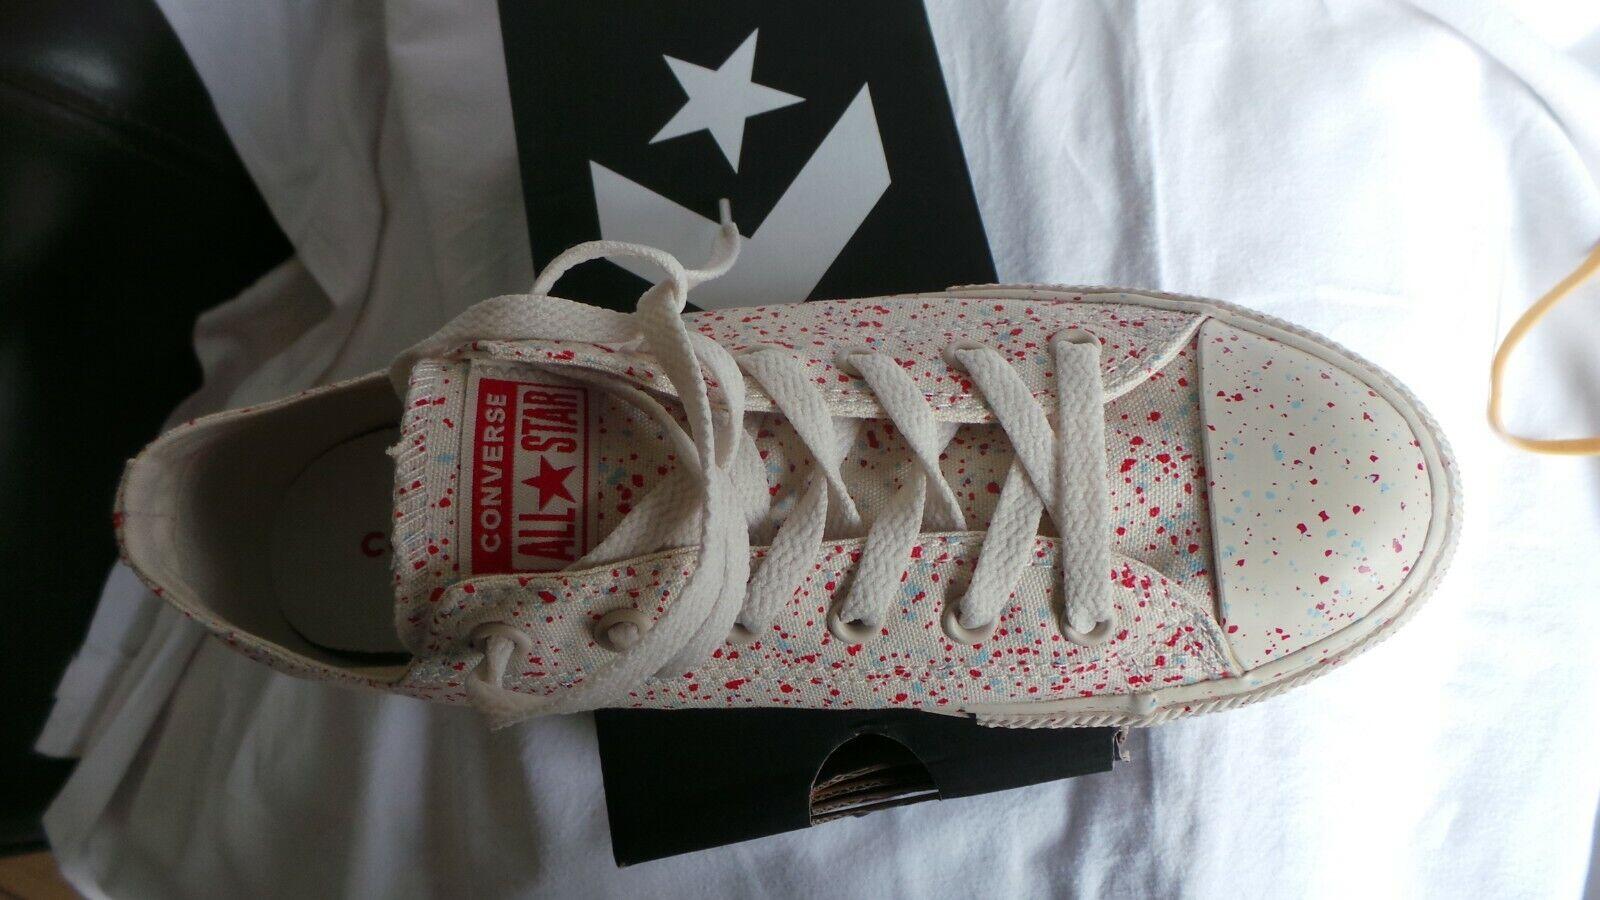 BRAND NEW in box Converse CT All Star Splatter Lo Ox trainer Größe 4 EU 37 Cream